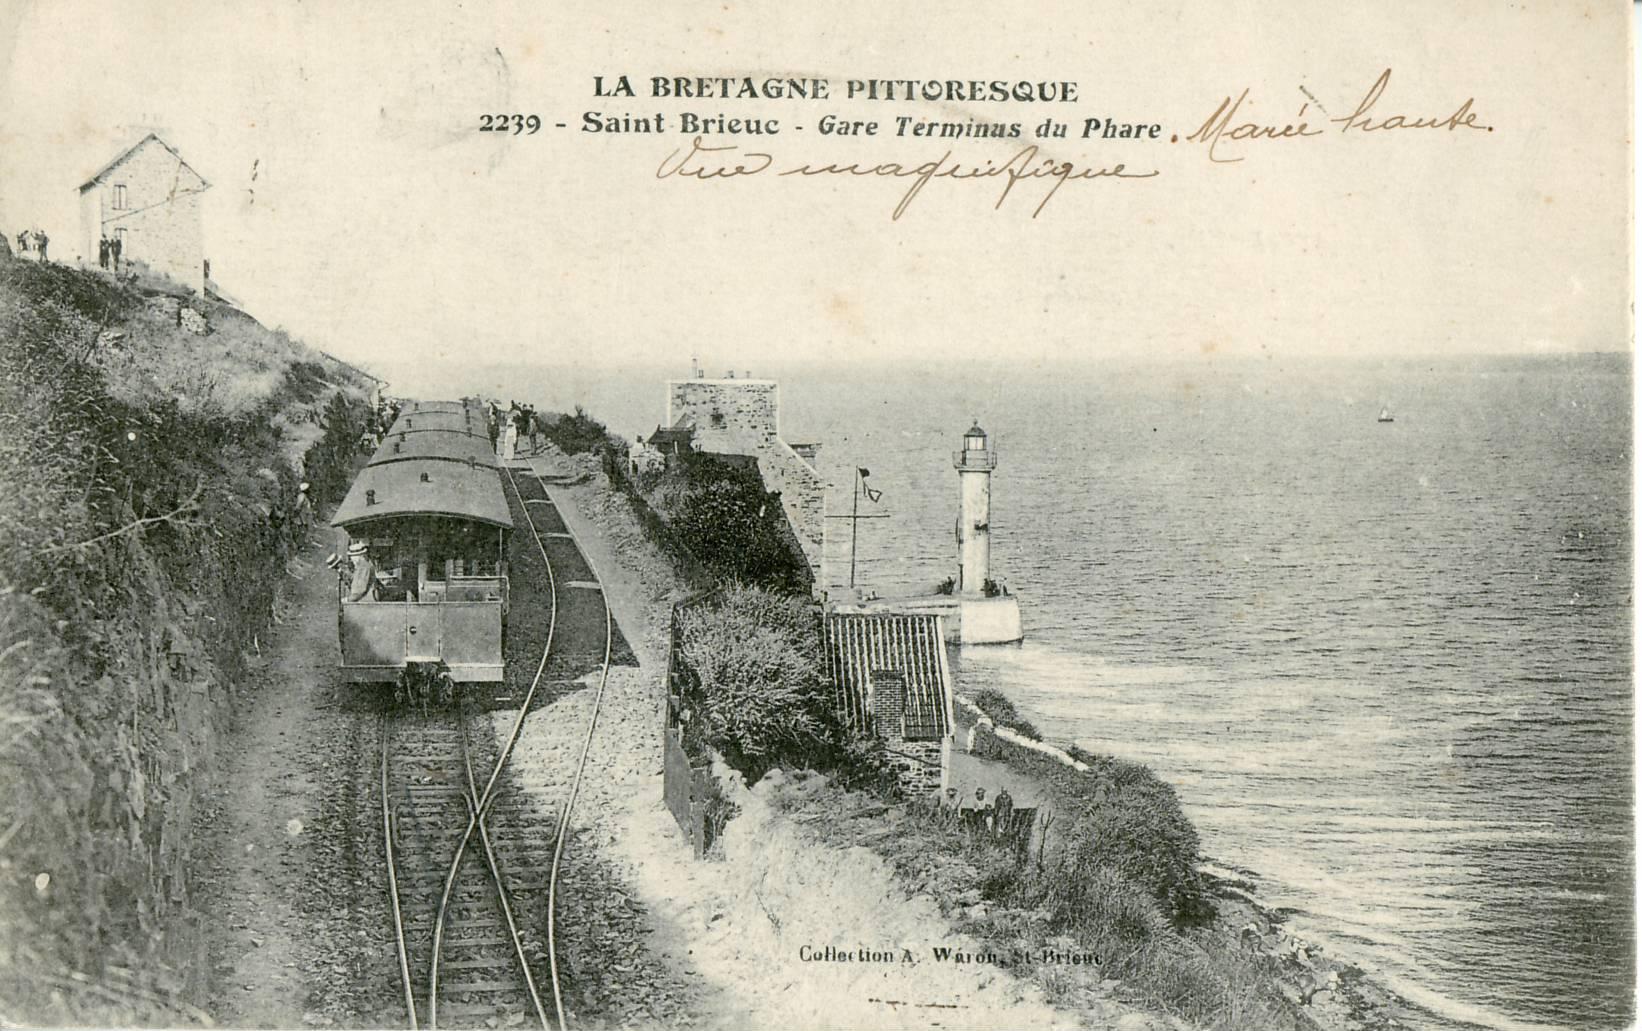 File:Waron 2239 - LA BRETAGNE PITTORESQUE - SAINT-BRIEUC - Gare terminus du